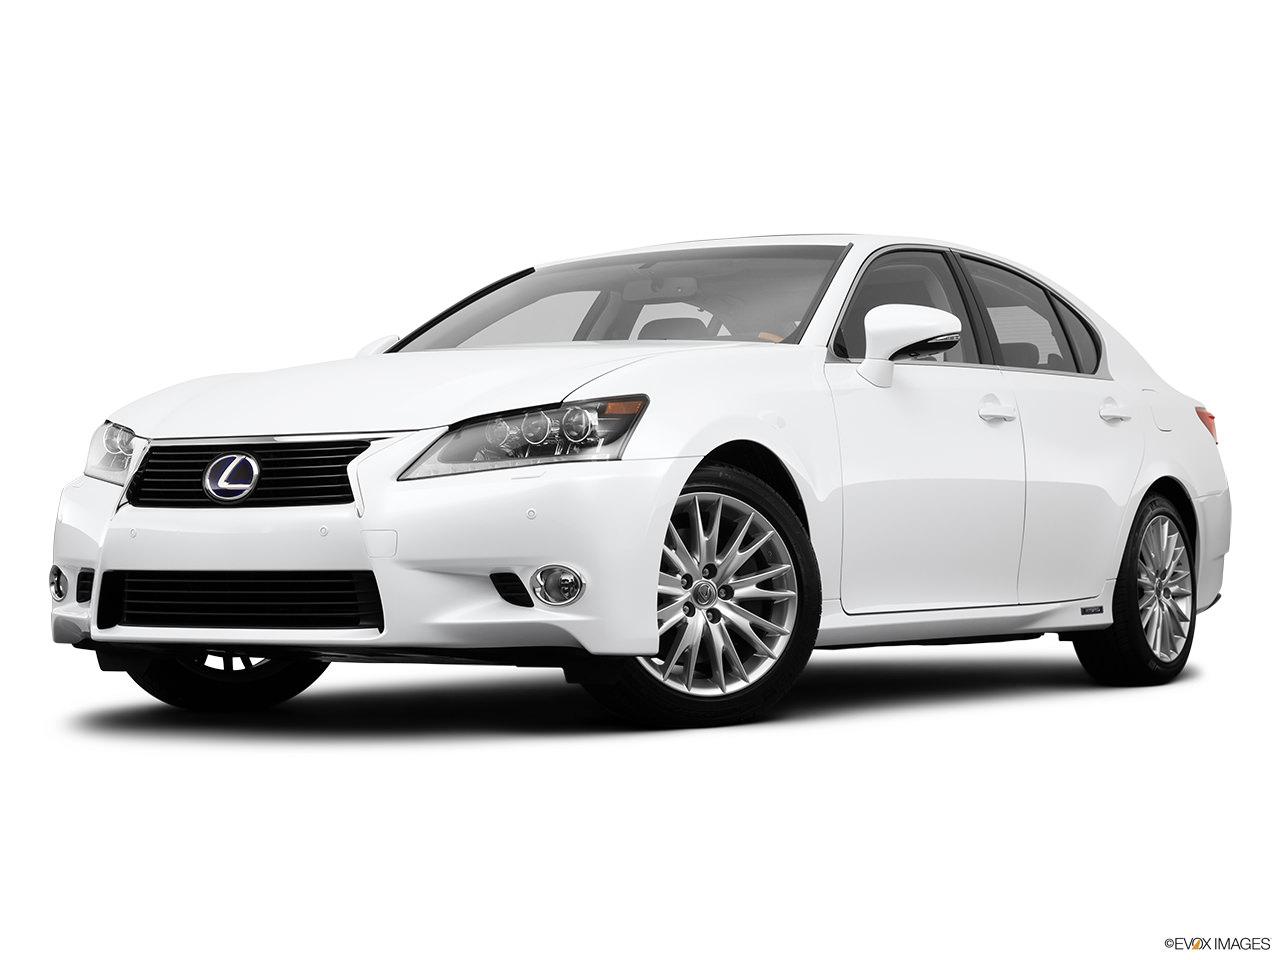 Lexus GS450h 2012